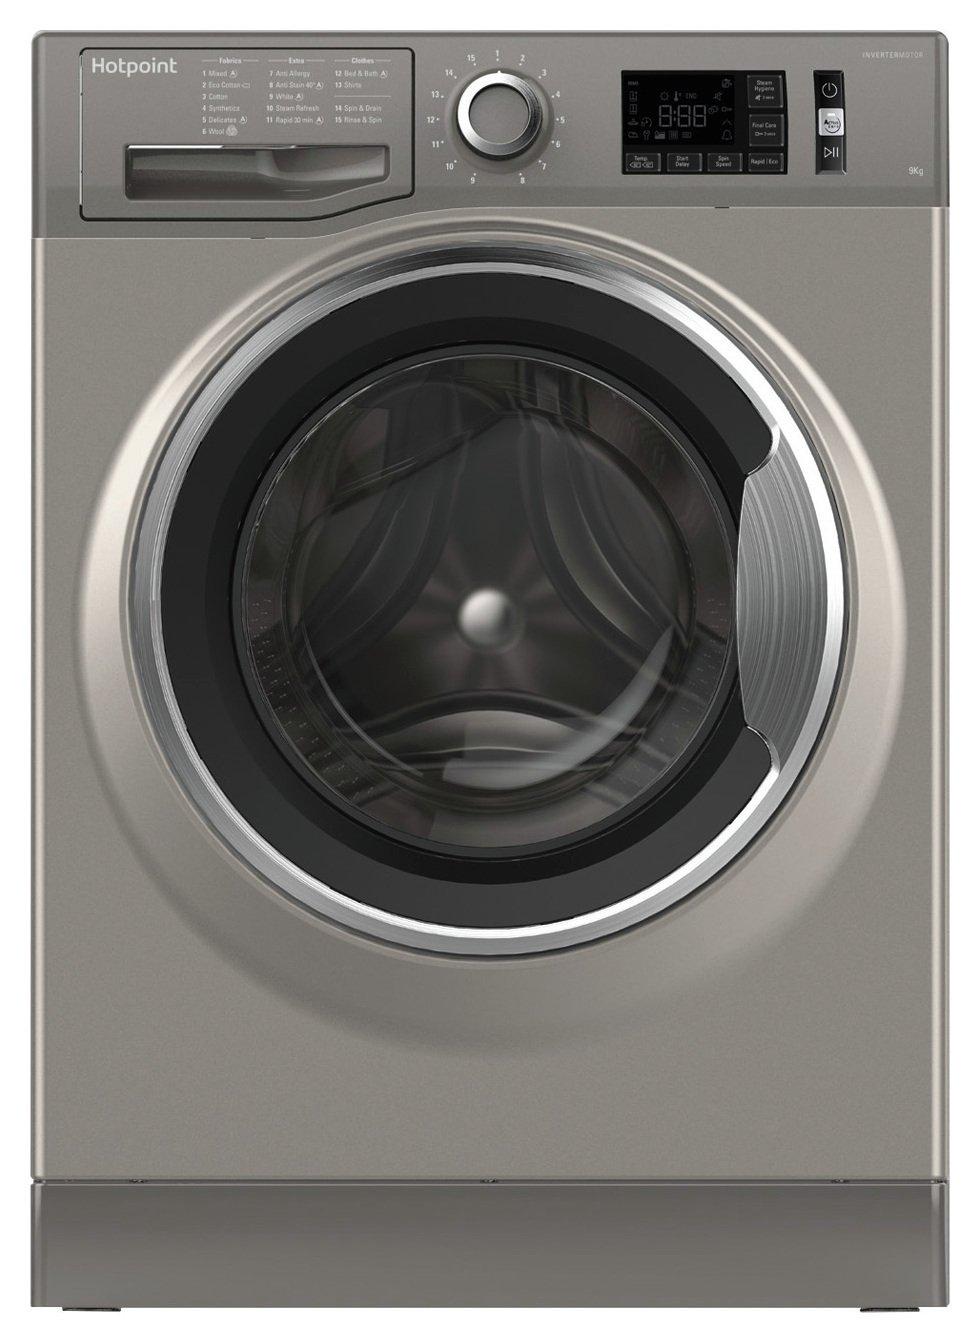 Hotpoint NM11946GCA 9KG 1400 Spin Washing Machine - Graphite